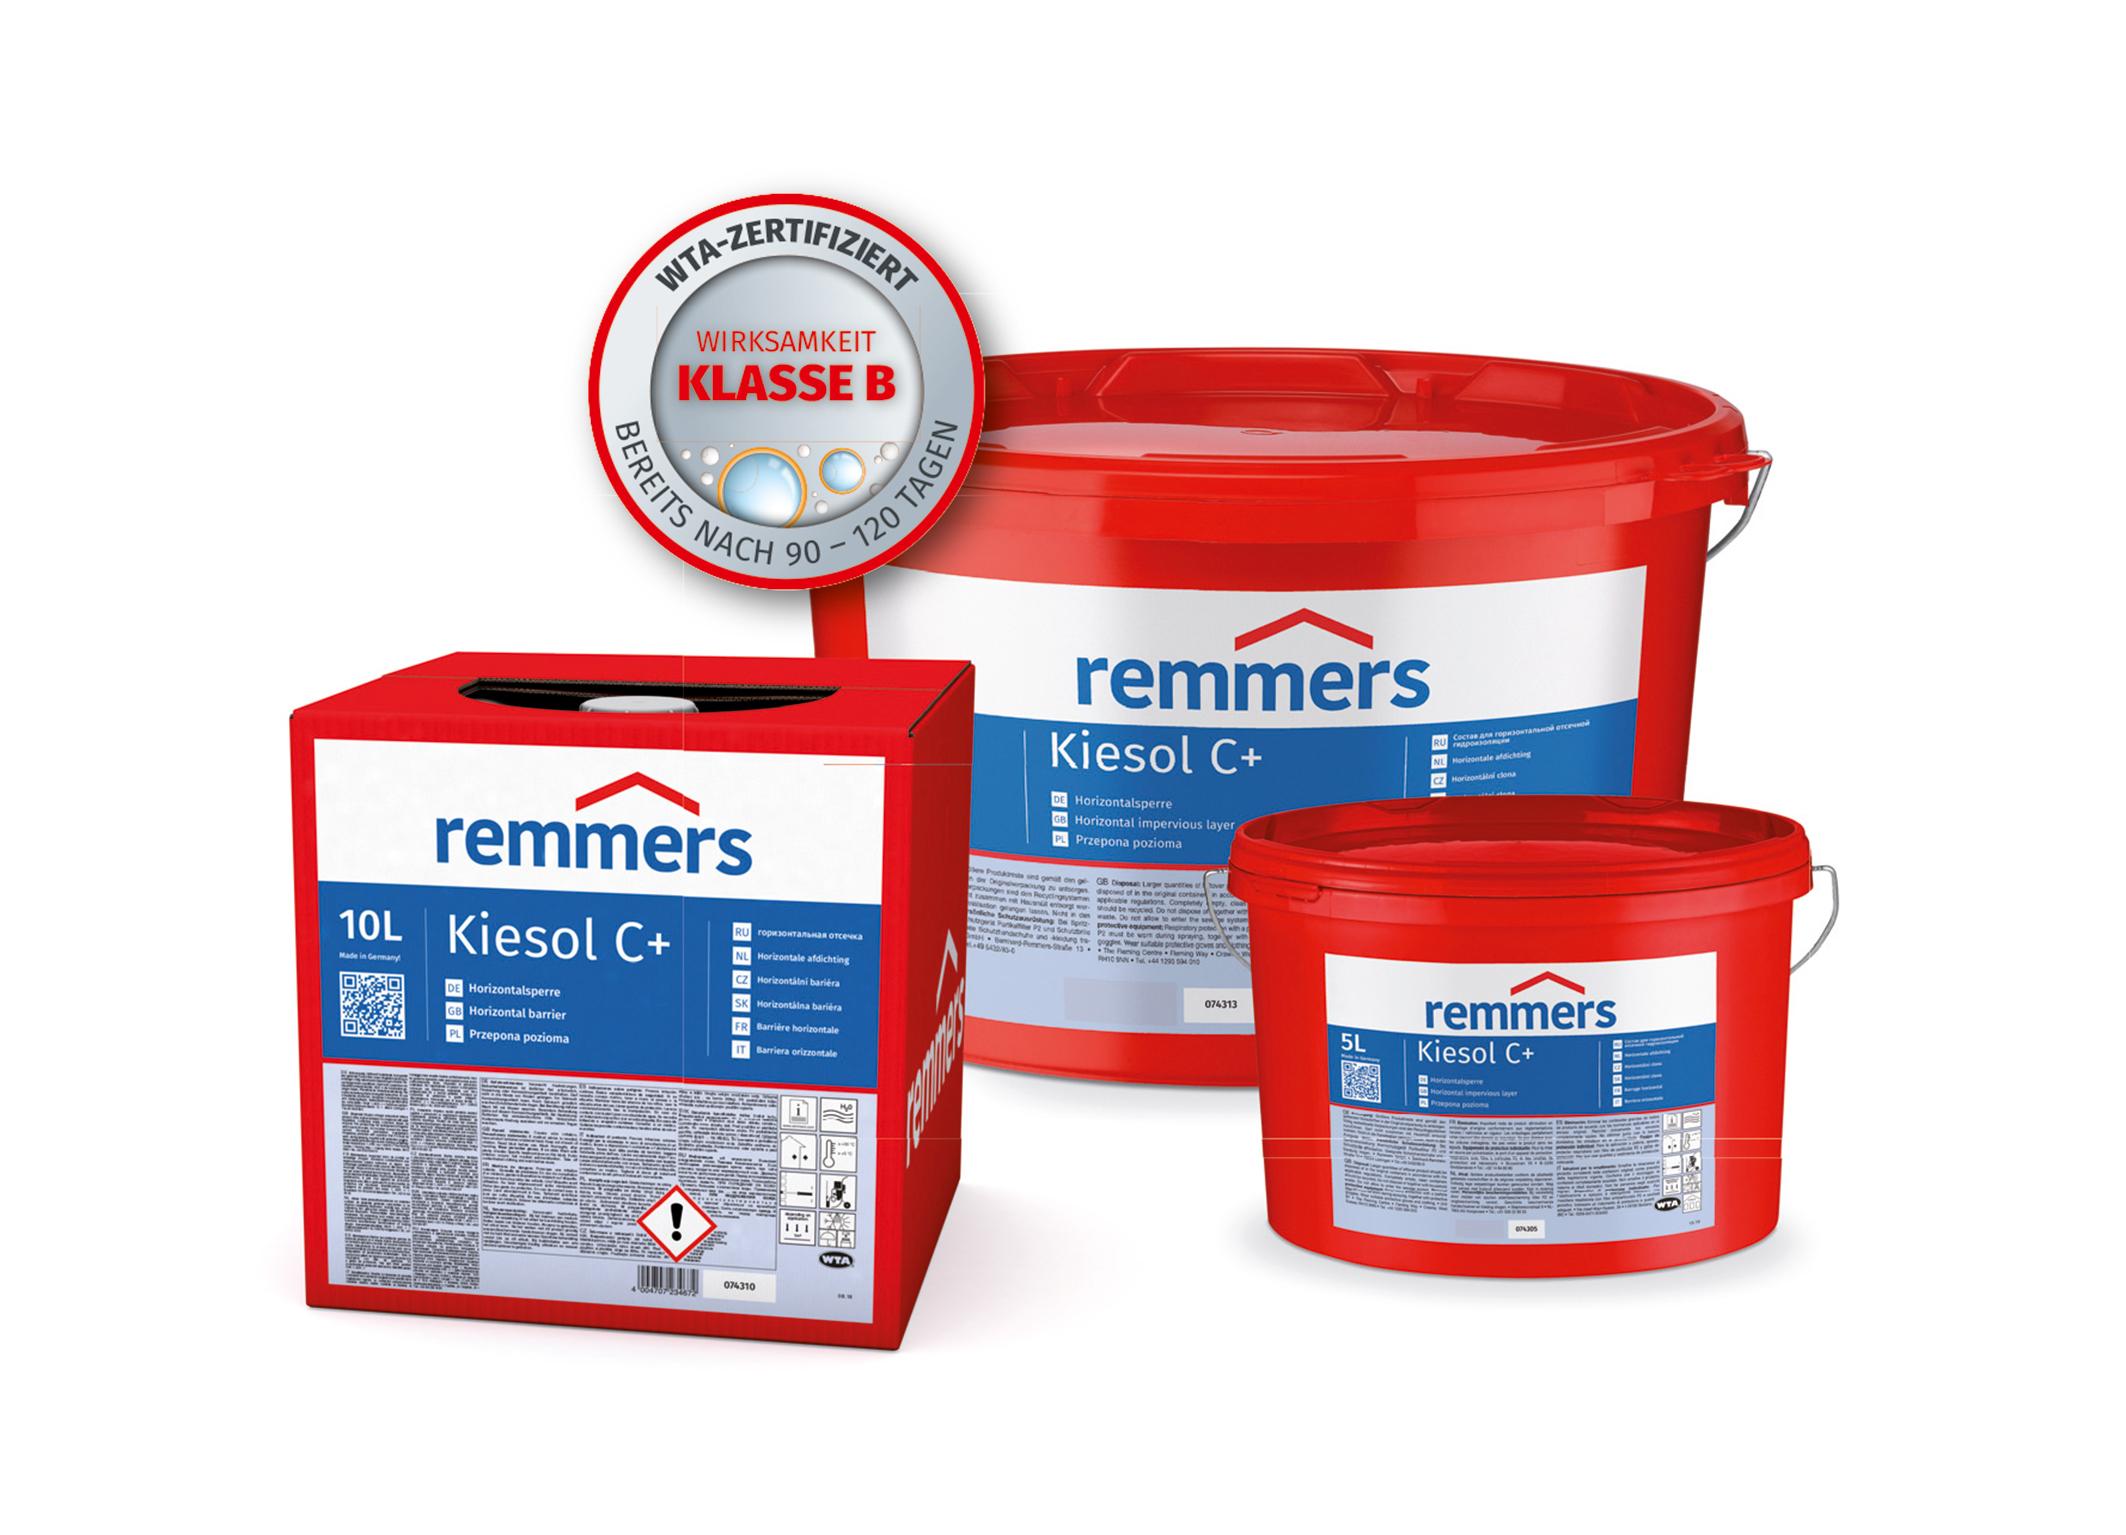 Onwijs Die High-Tech-Creme mit dem Turbo-Effekt, Remmers GmbH XE-86